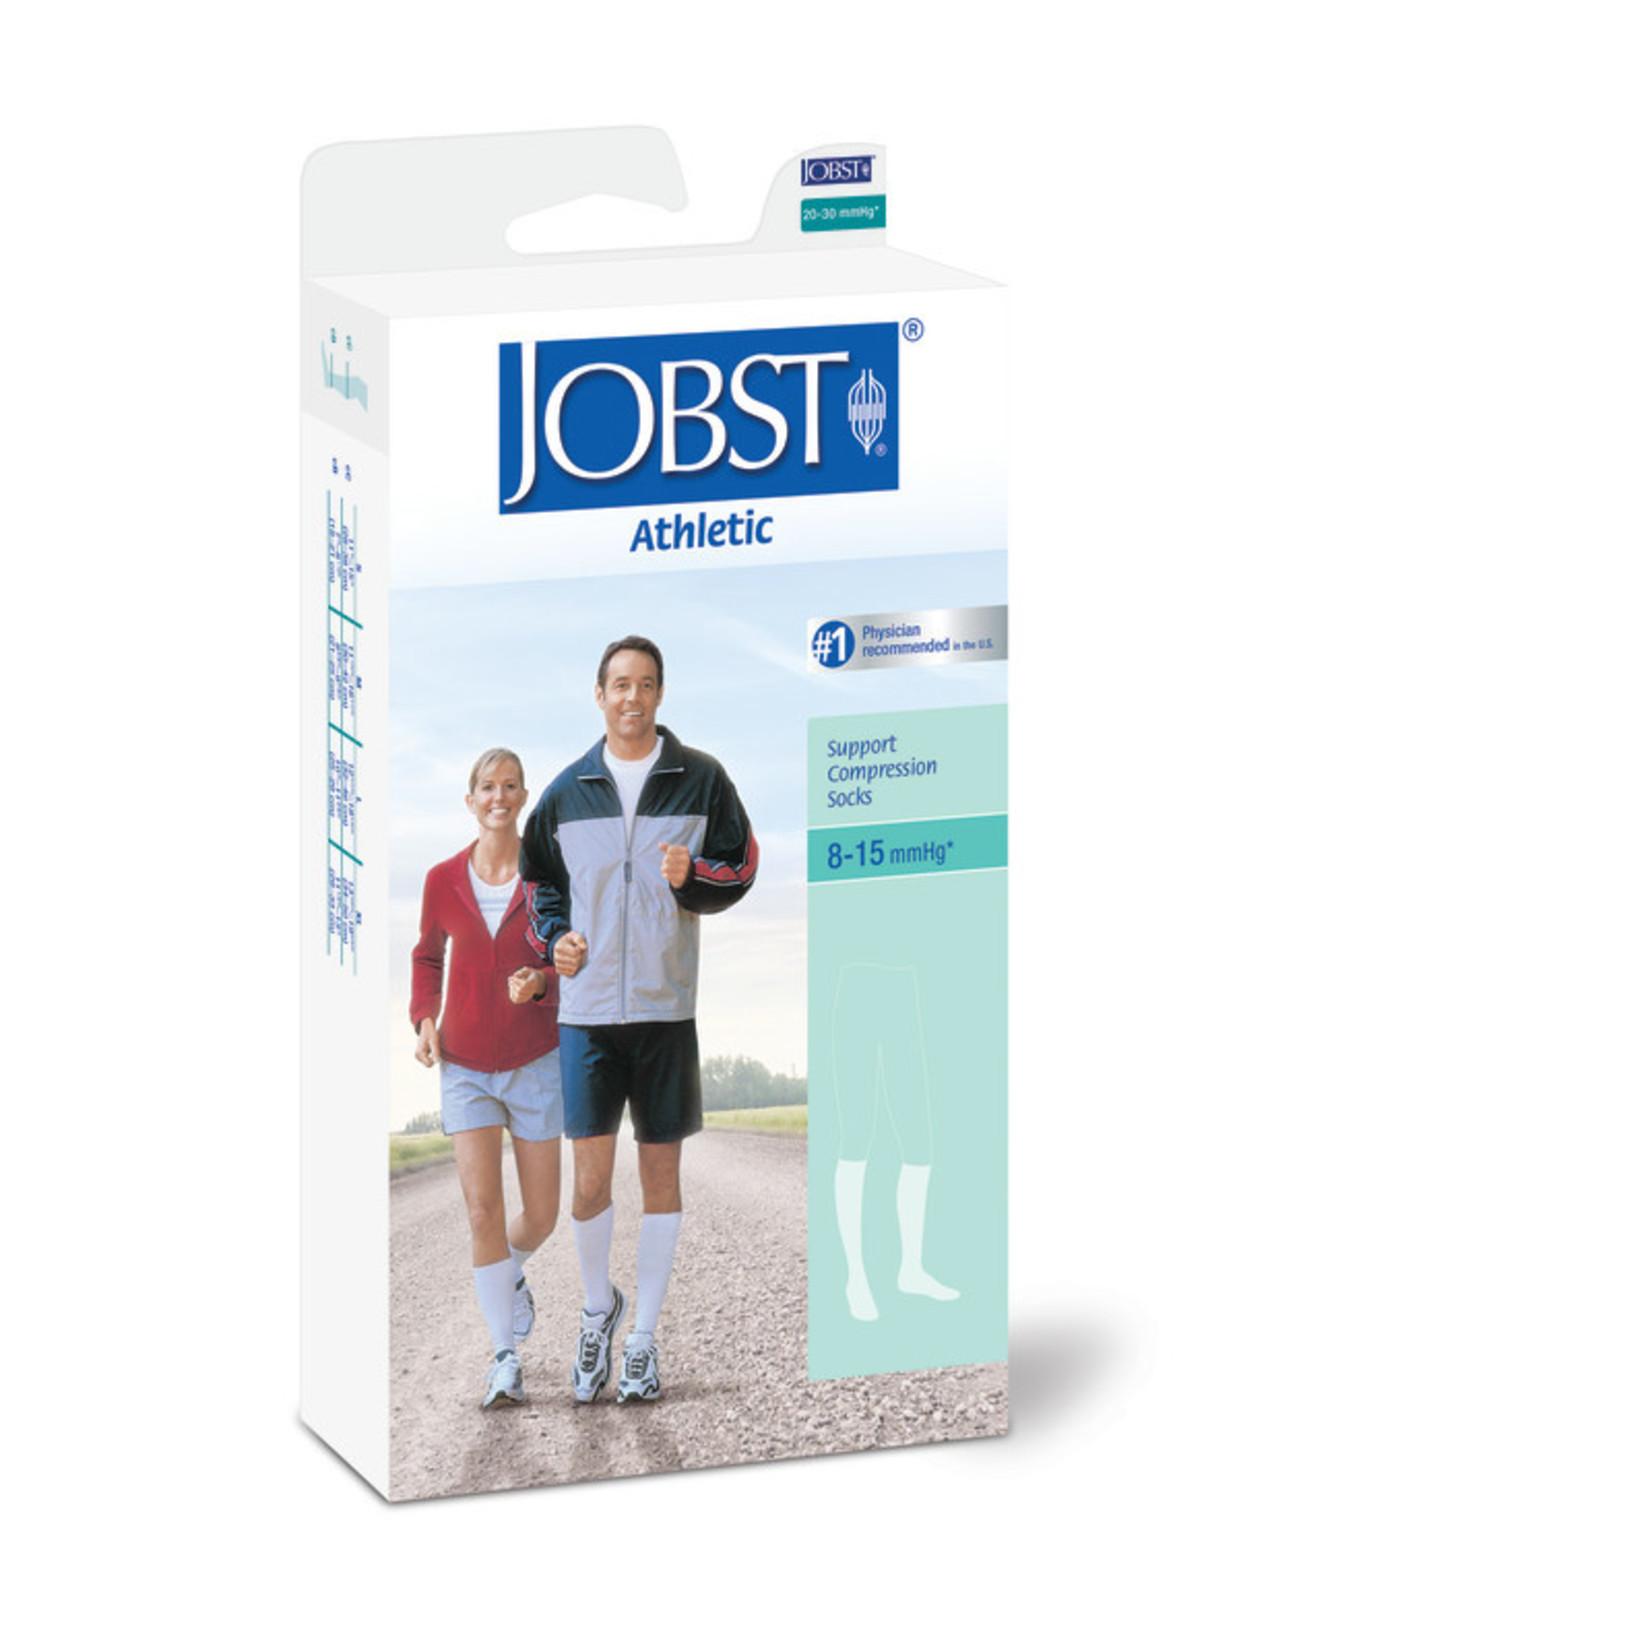 JOBST JOBST ATHLETIC KNEE CLOSED TOE WHITE 8-15 mmHg